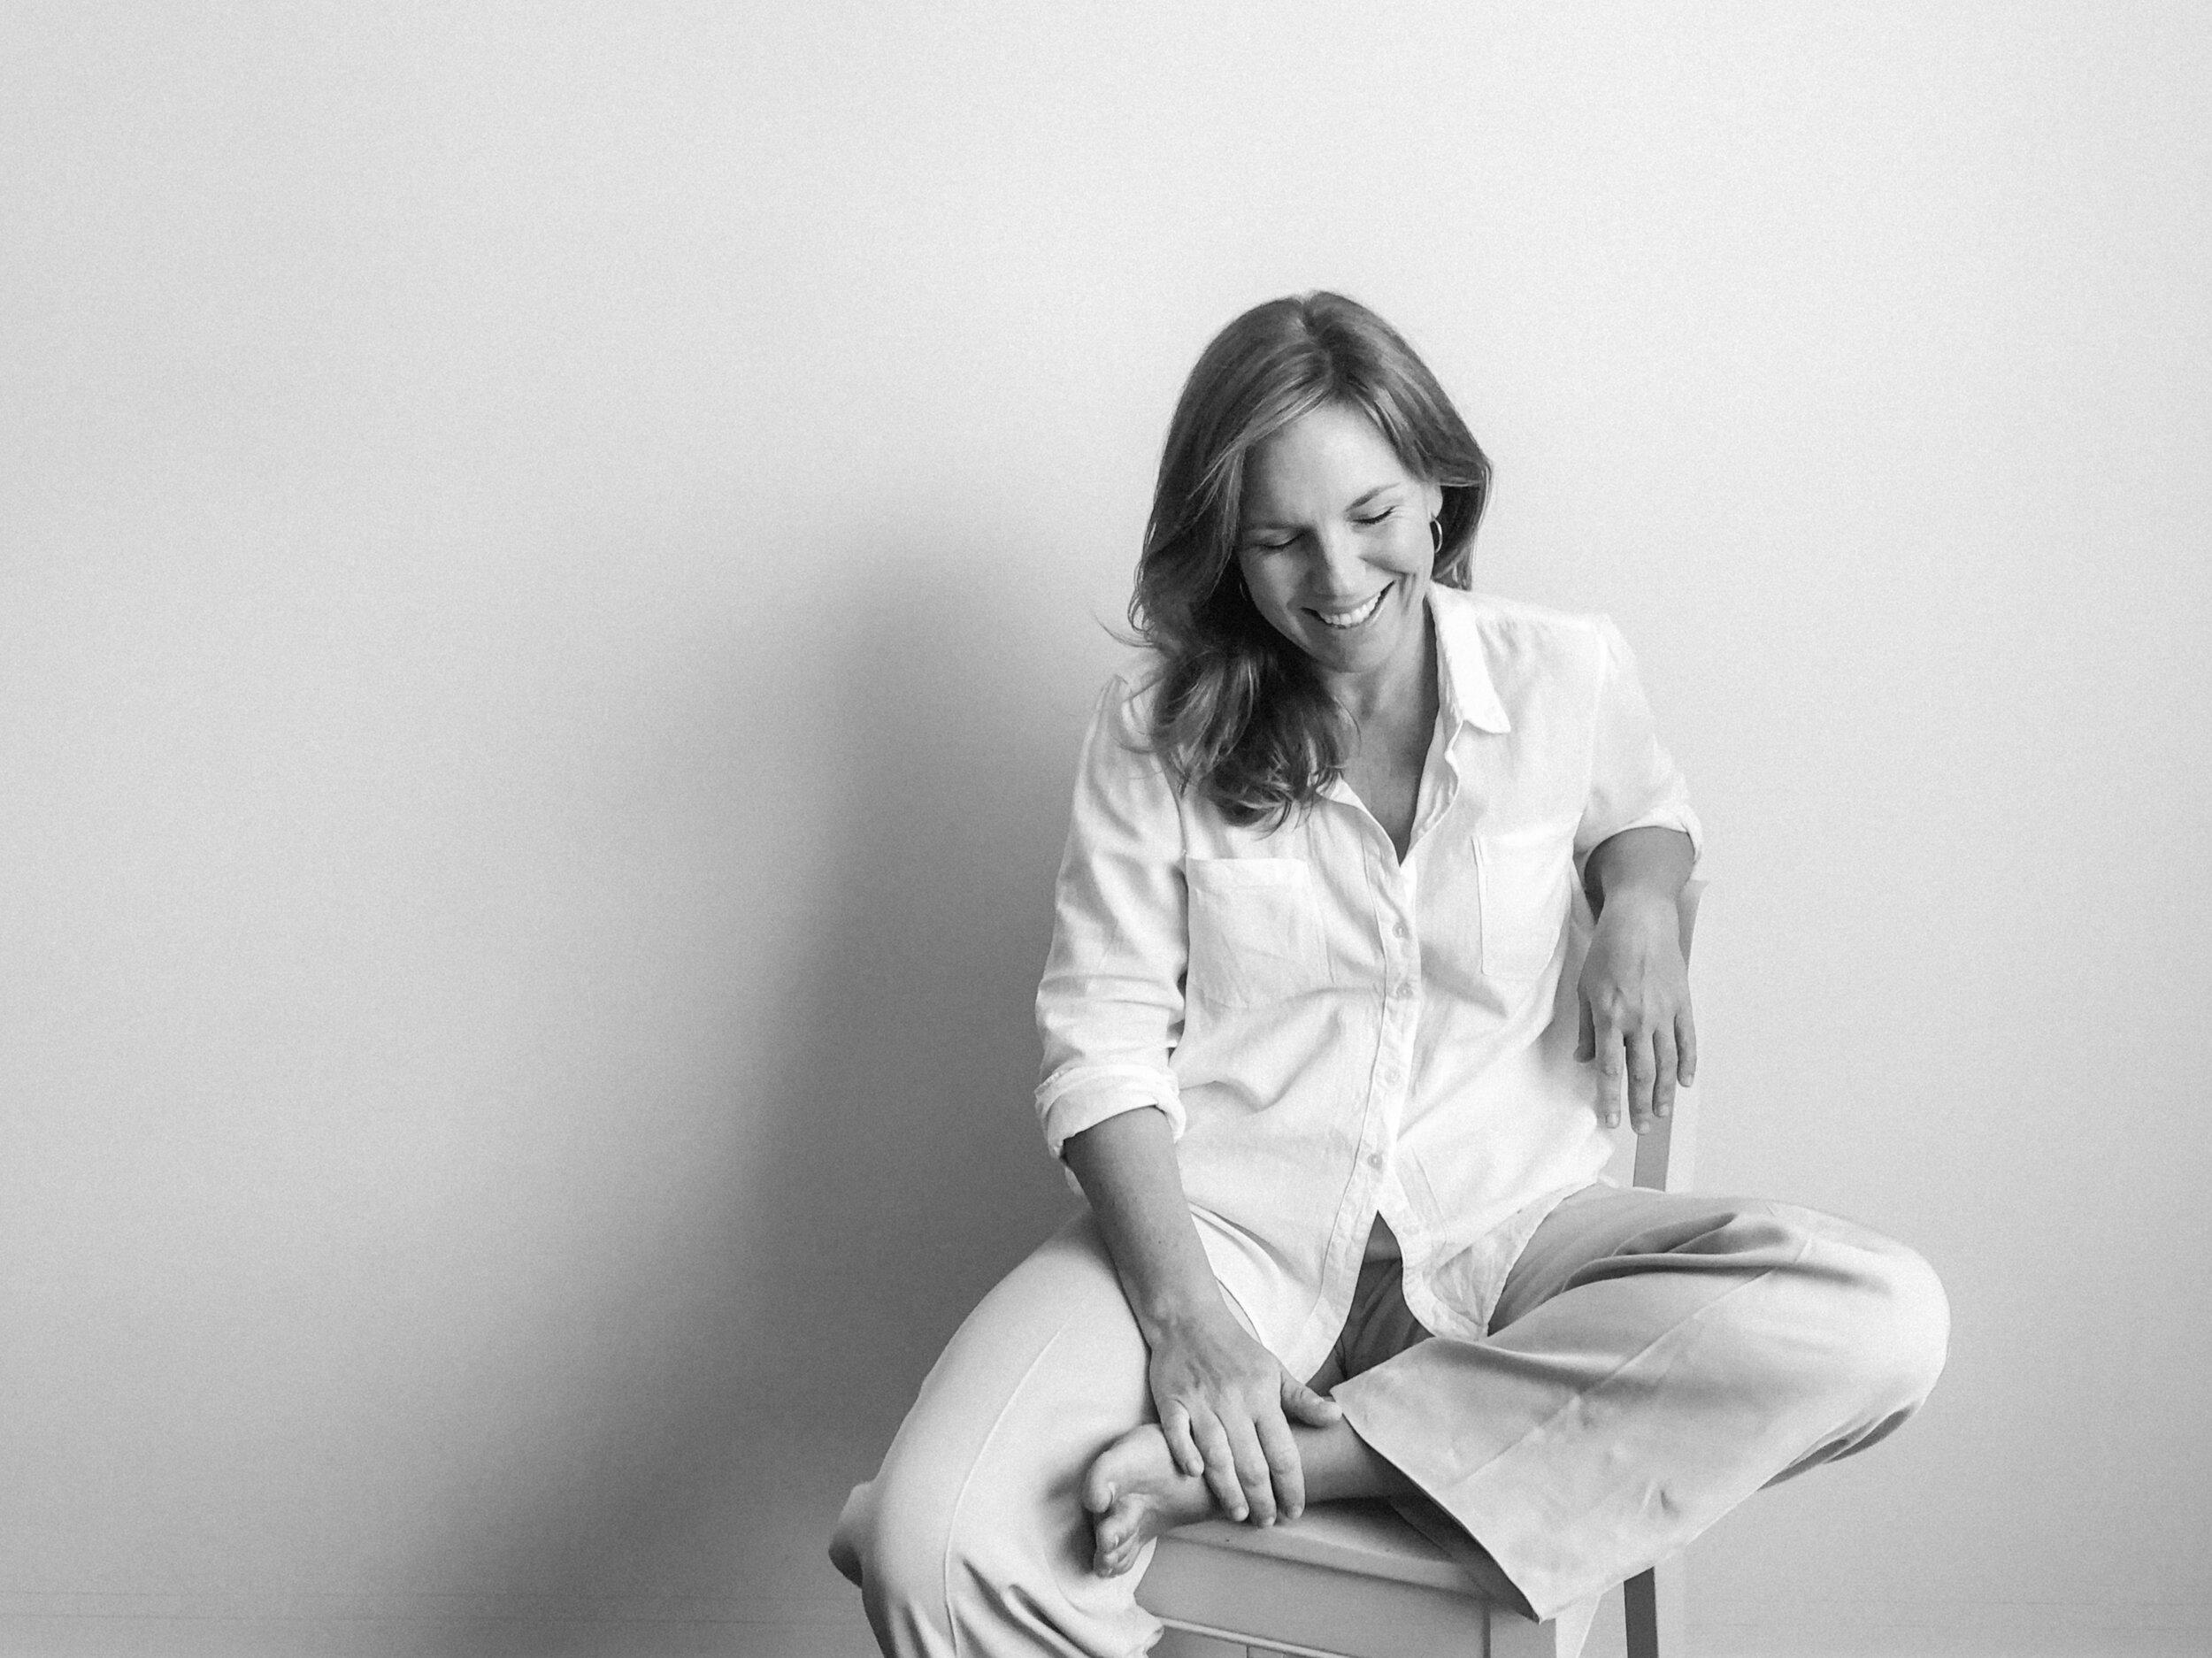 MARTA LOCKLEAR - Photographer